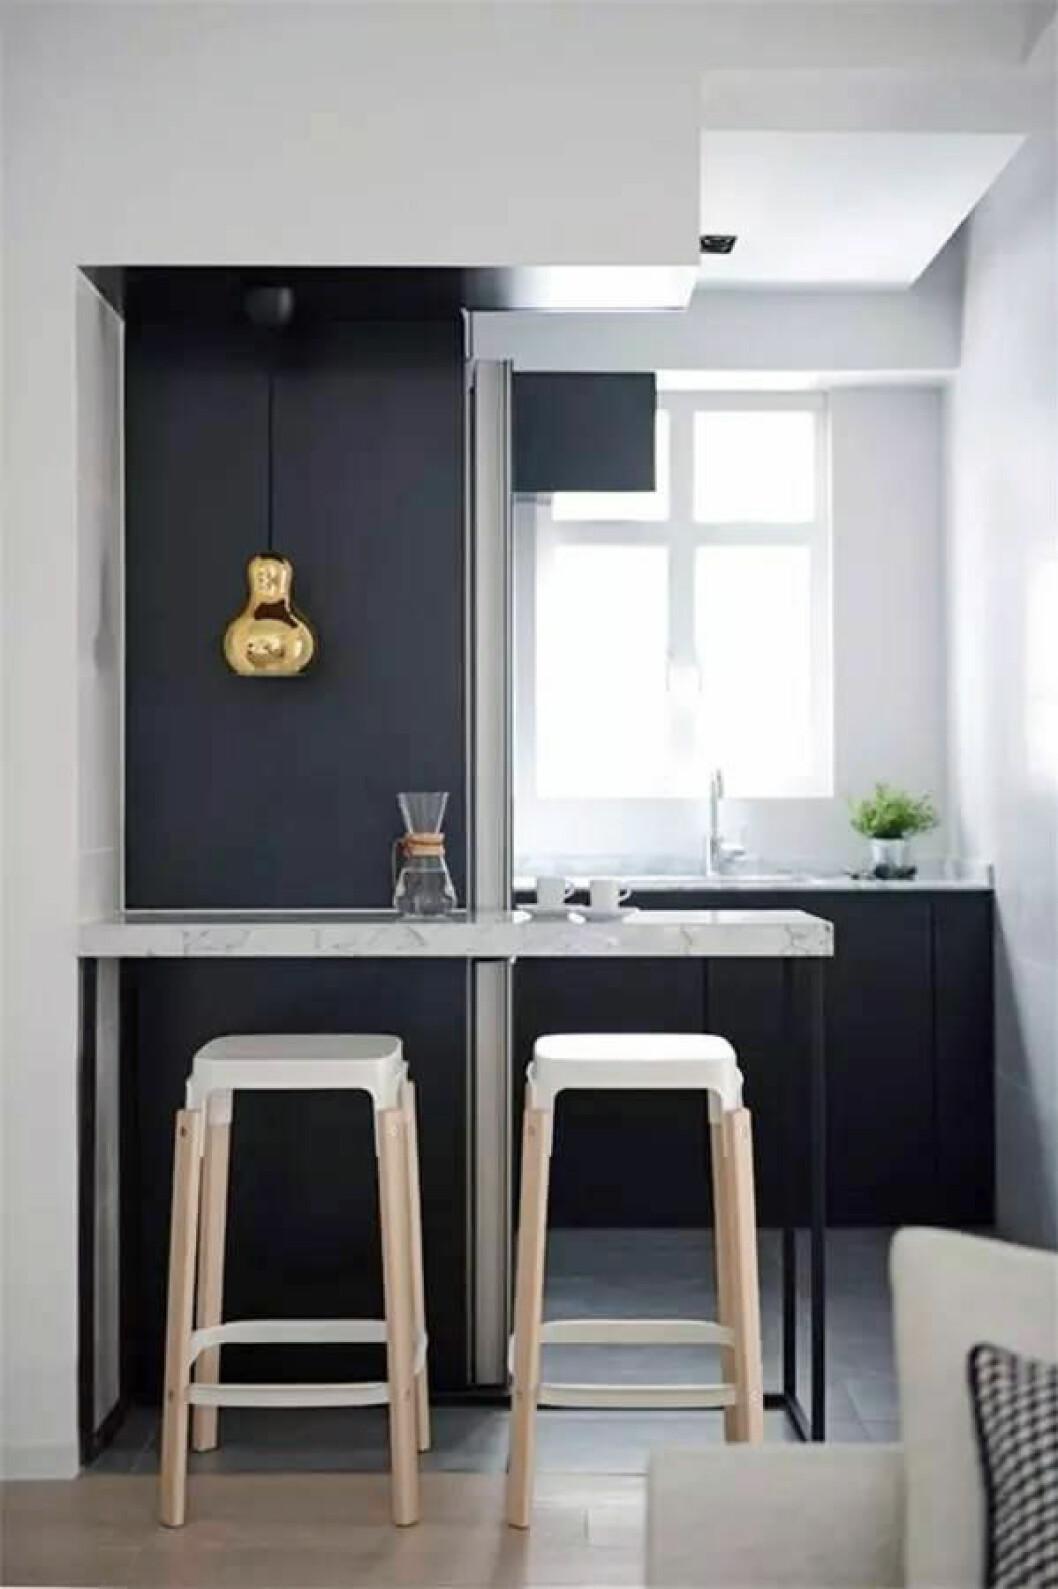 09. compact-kitchen